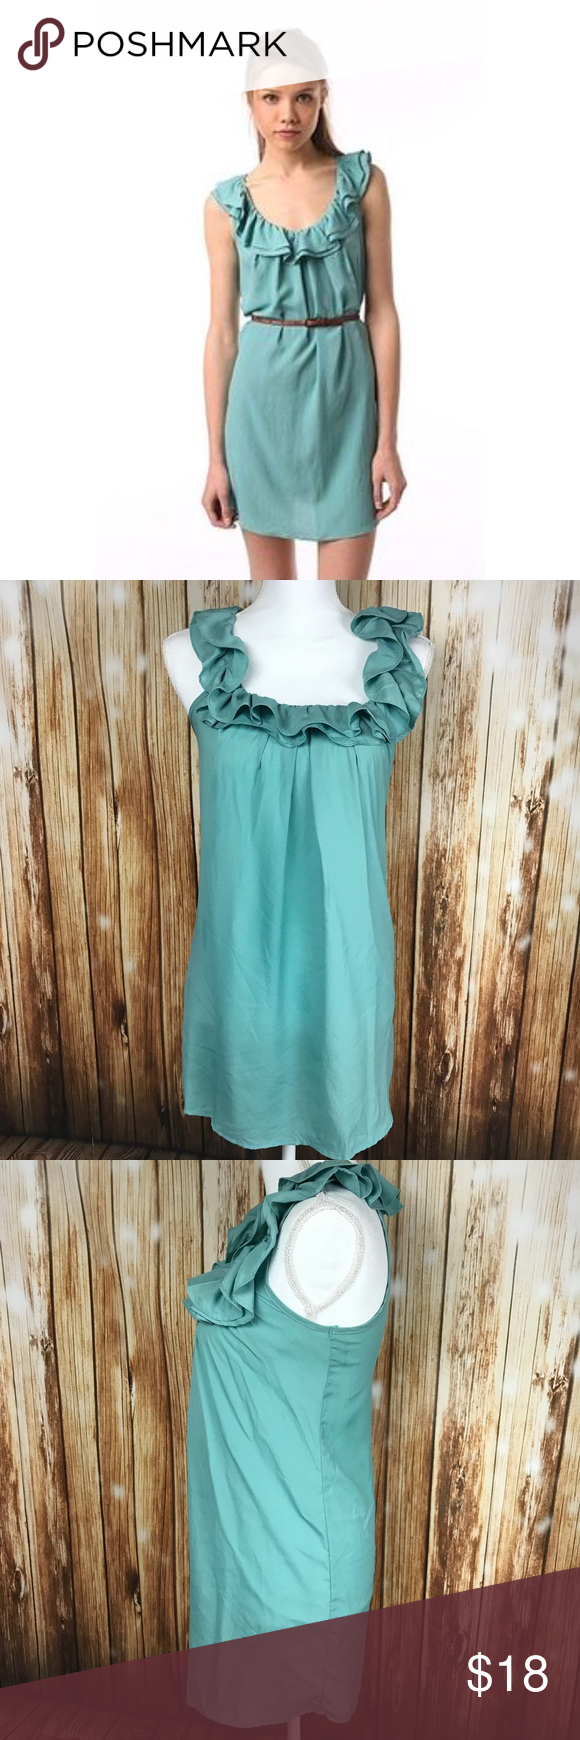 Pins & Needles Sea Green Dress Urban Outfitters XS Pins